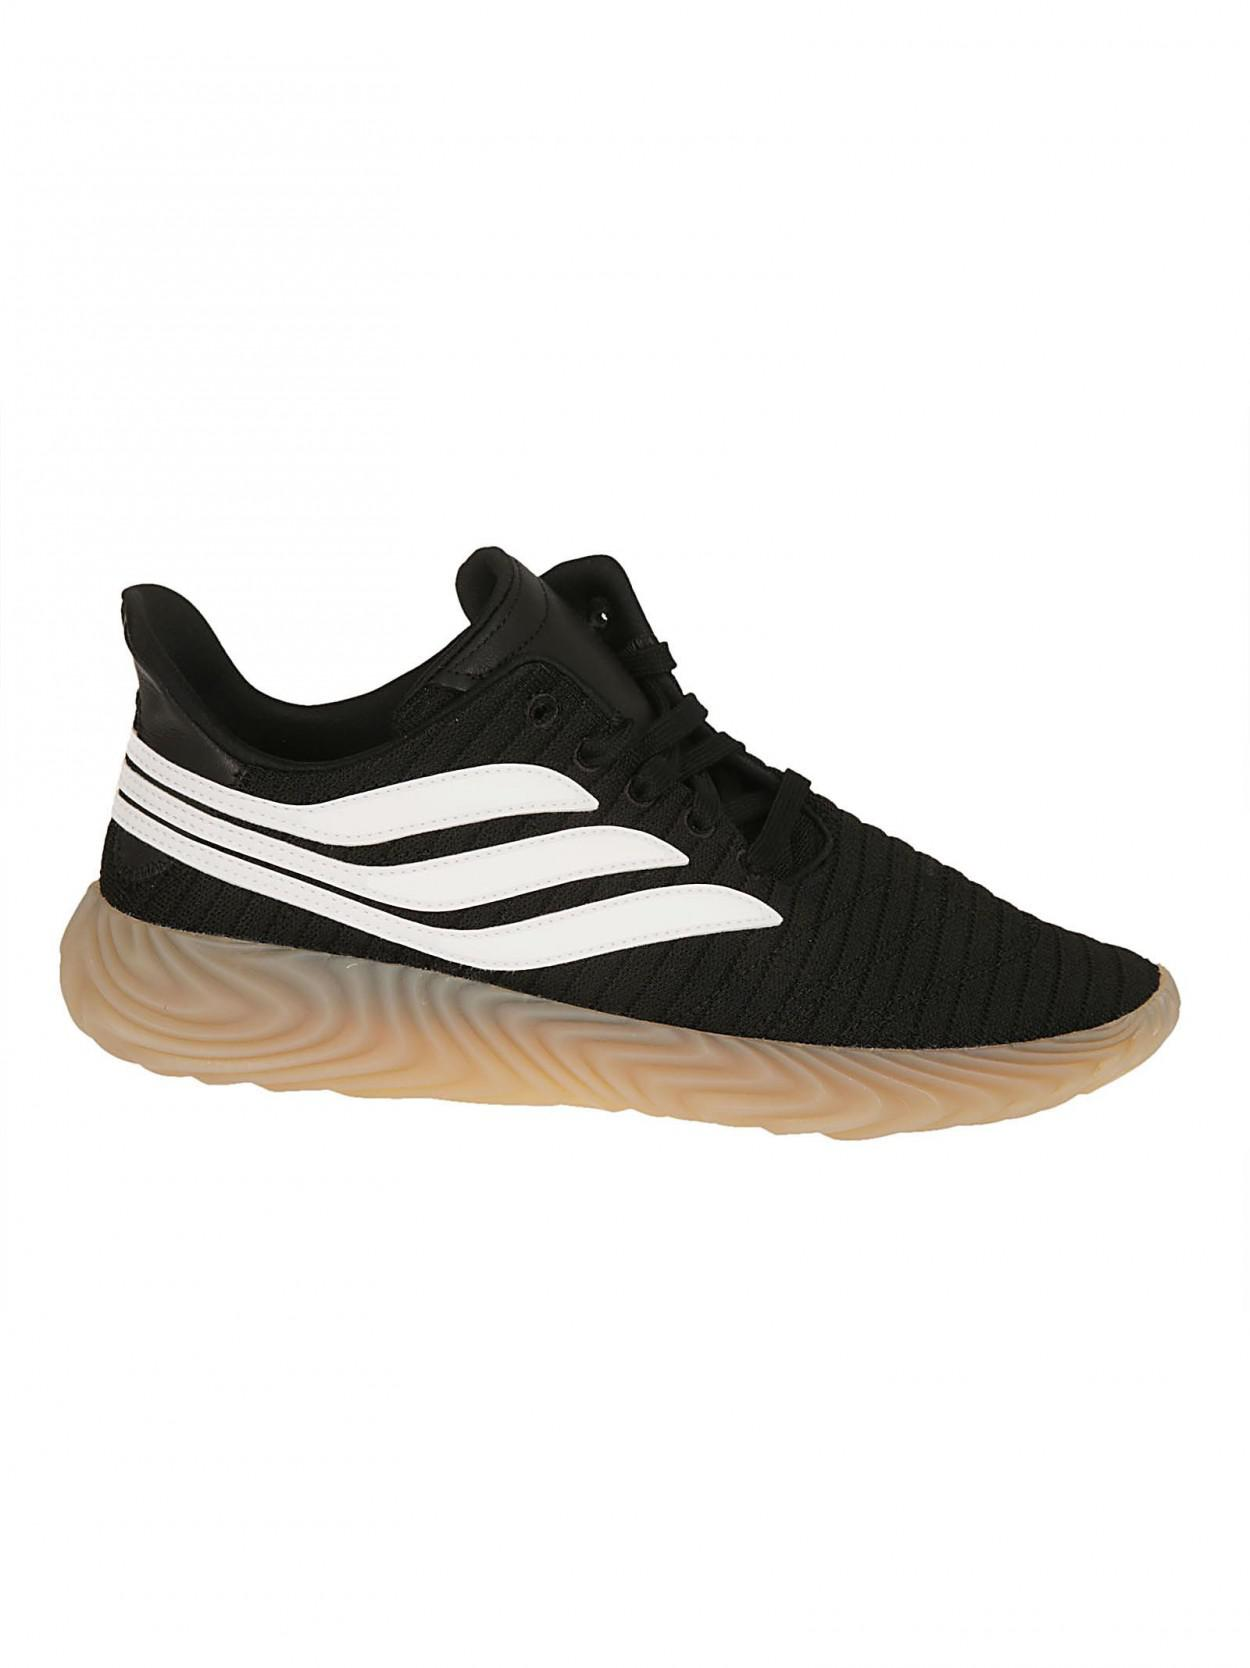 Lyst adidas originali adidas originali sobakov nera in scarpe da ginnastica